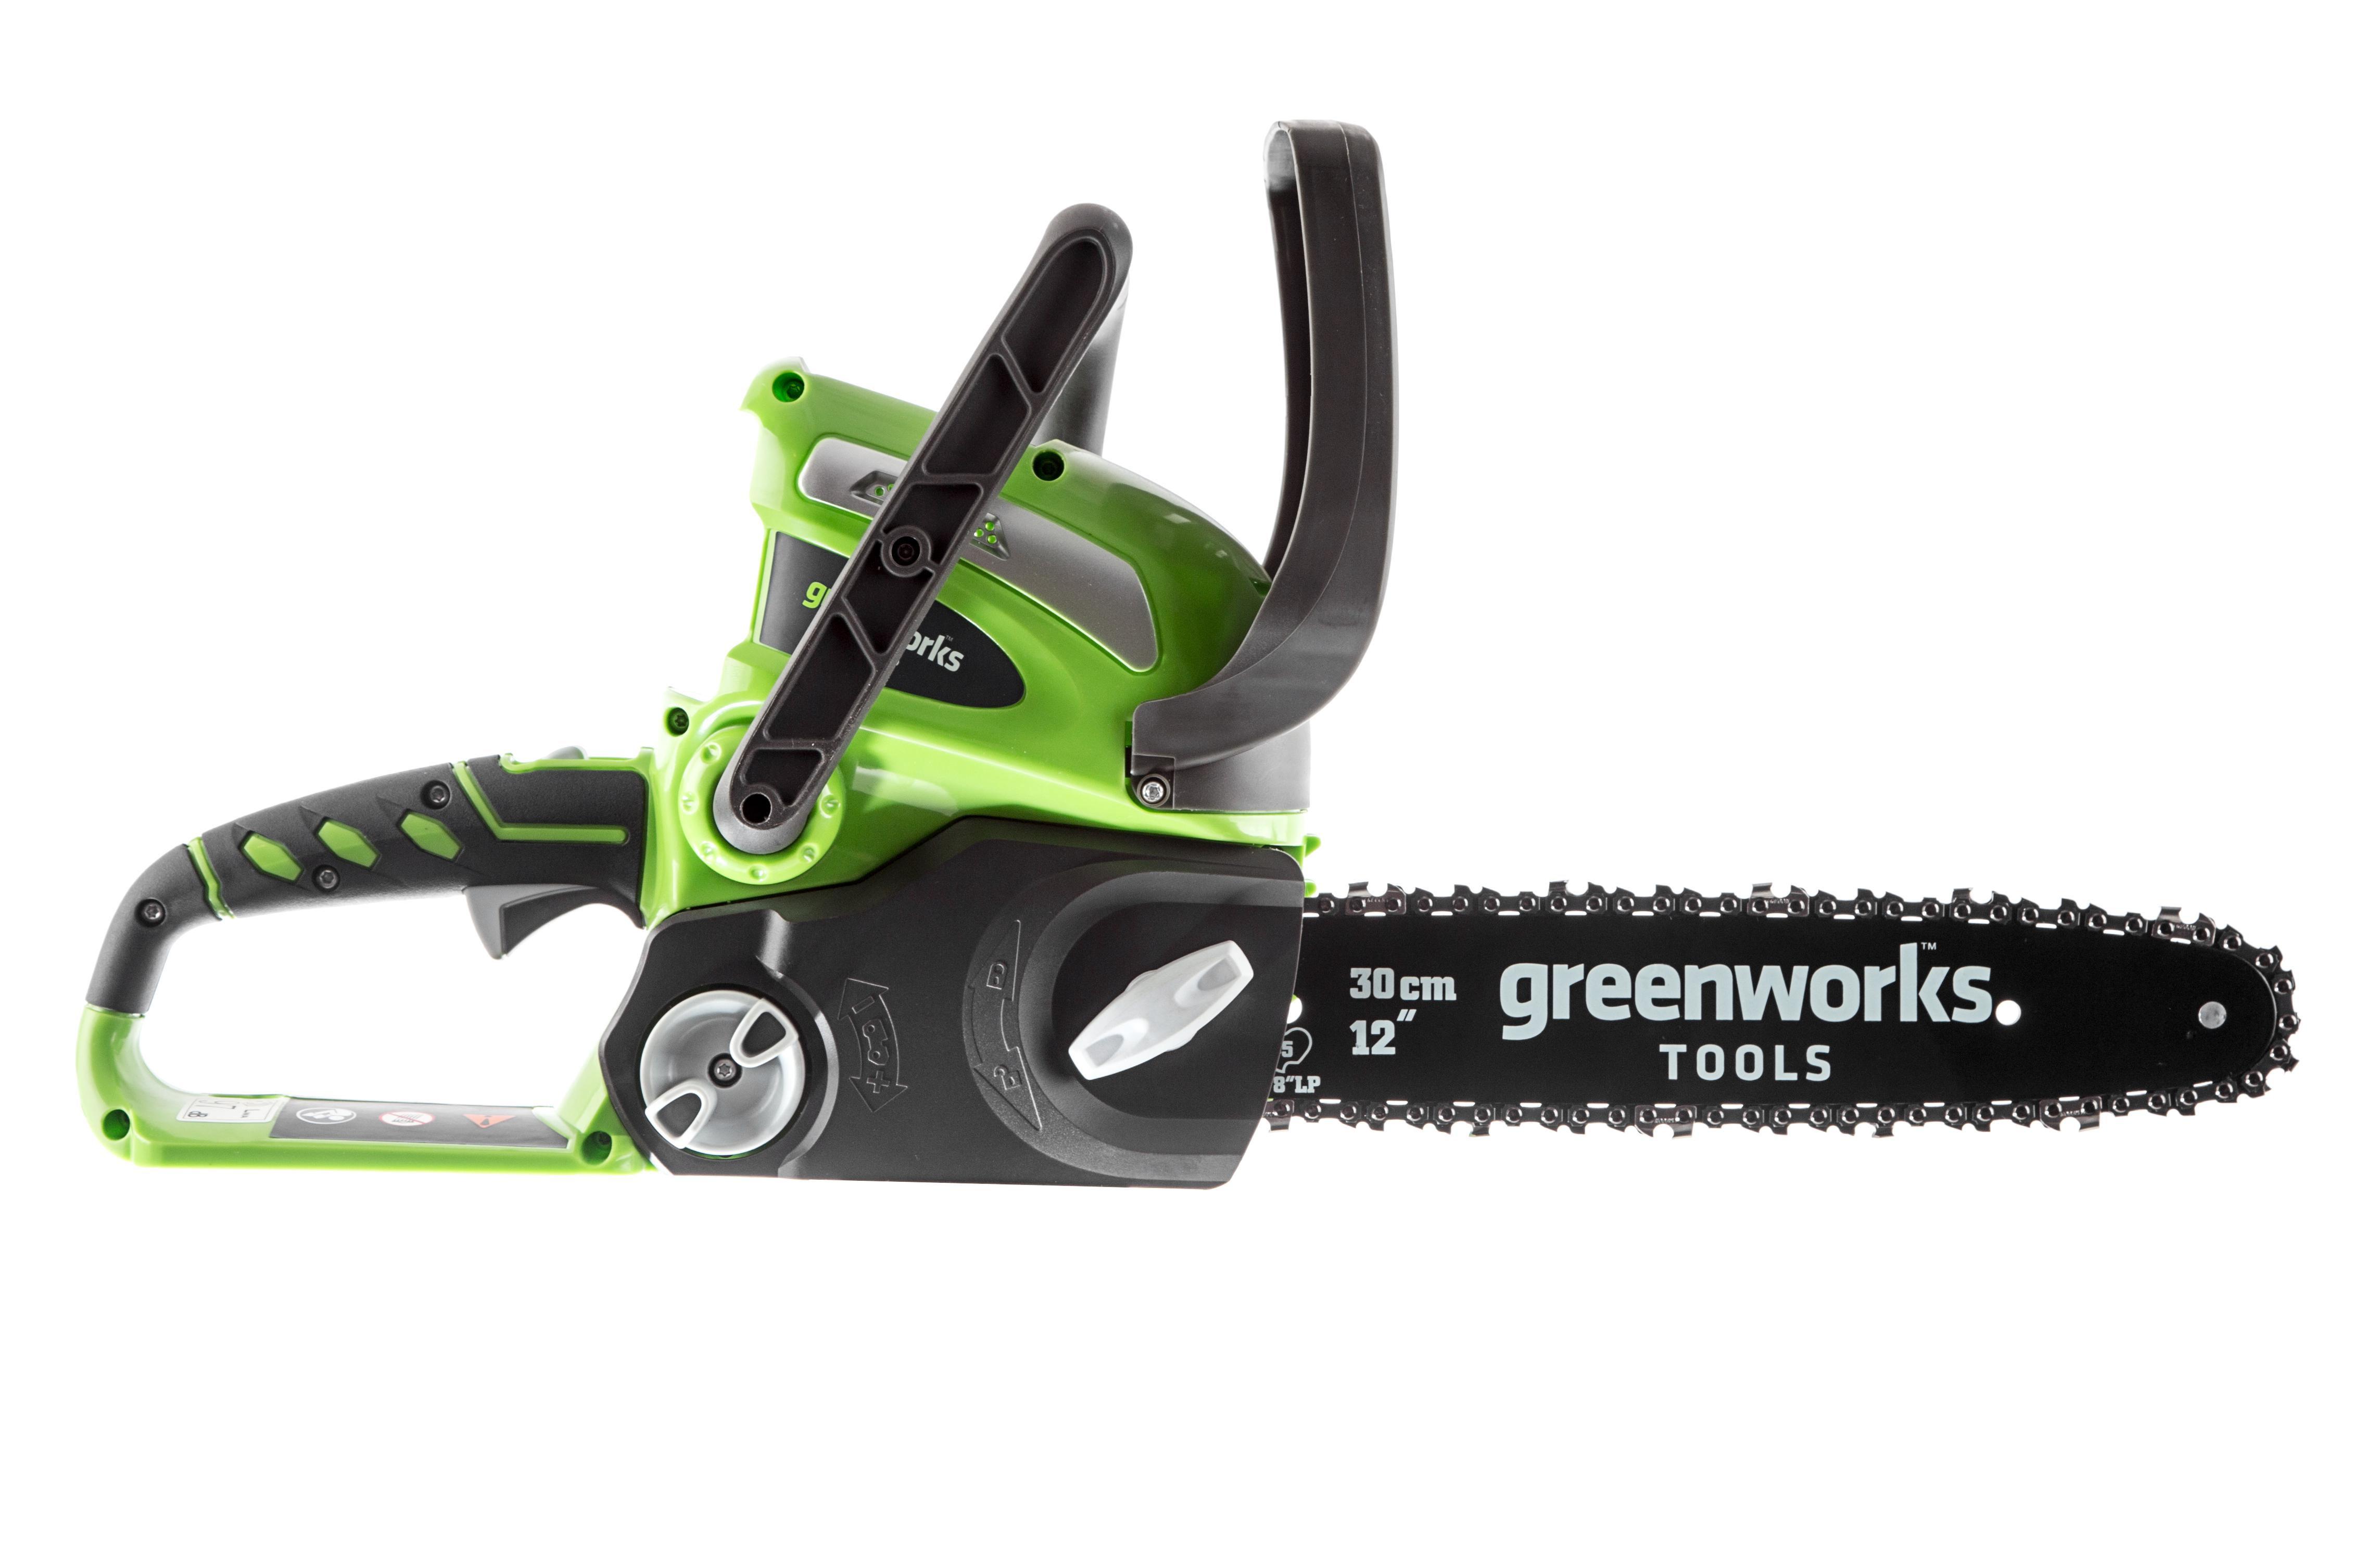 Пила цепная аккумуляторная Greenworks G40cs30 (20117) БЕЗ АККУМ и ЗУ пила цепная аккумуляторная greenworks gd60cs40 2001807 без аккум и зу